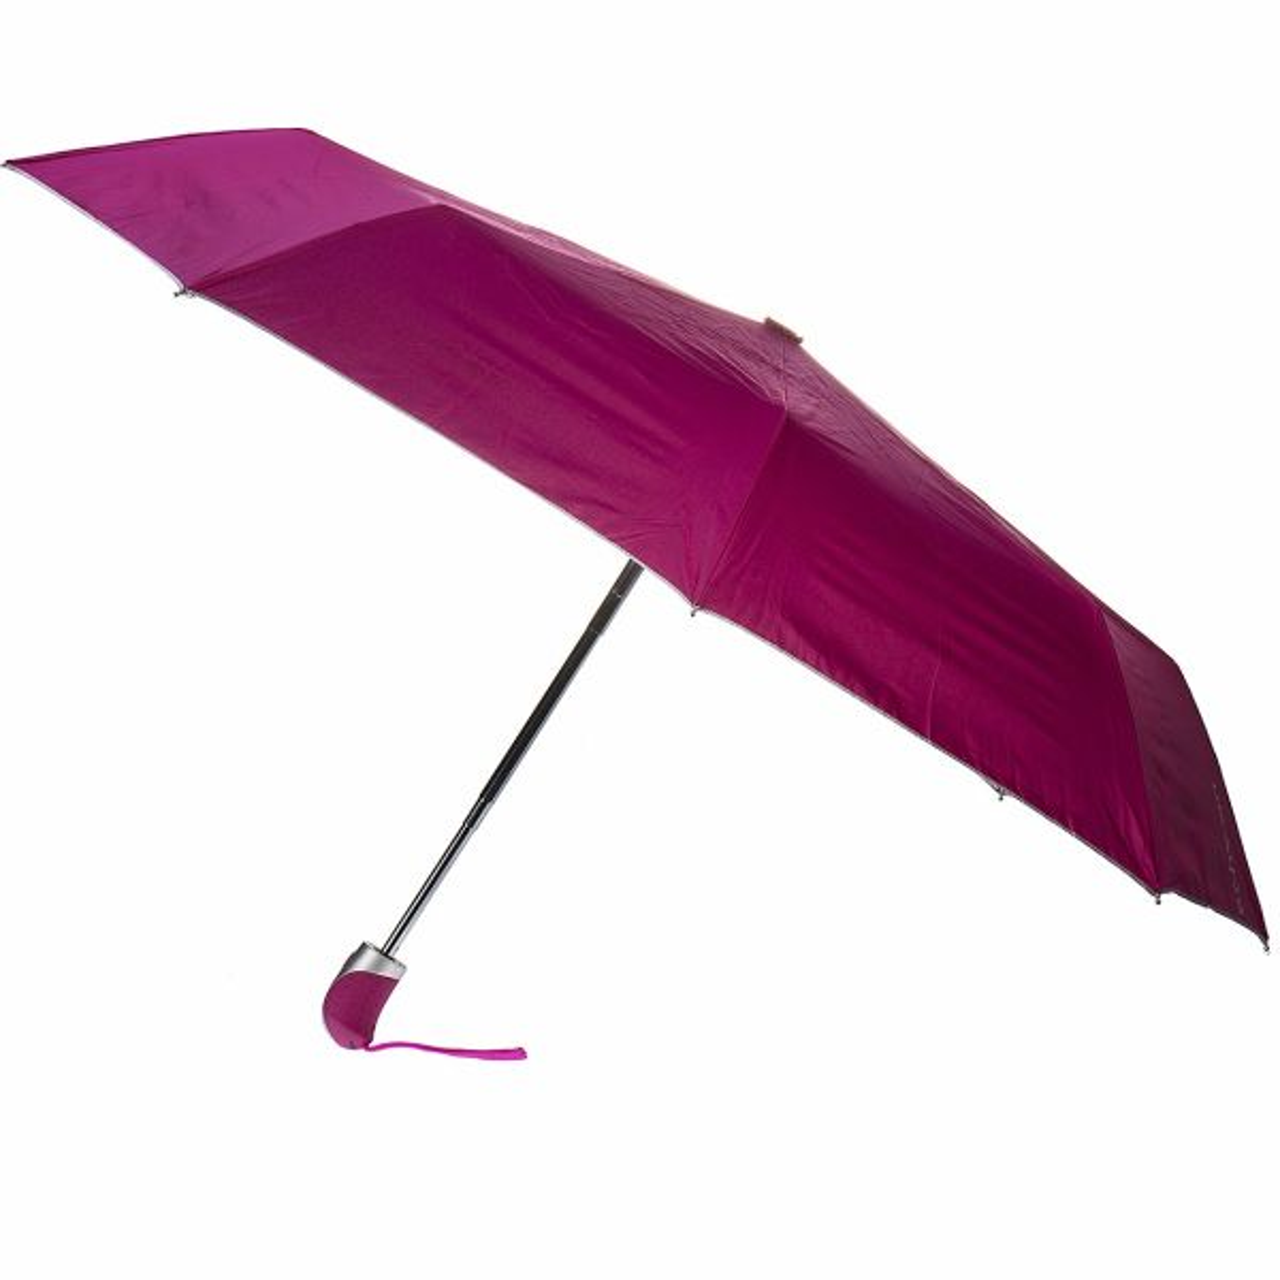 چتر شوان مدل چاووش کد 9-300